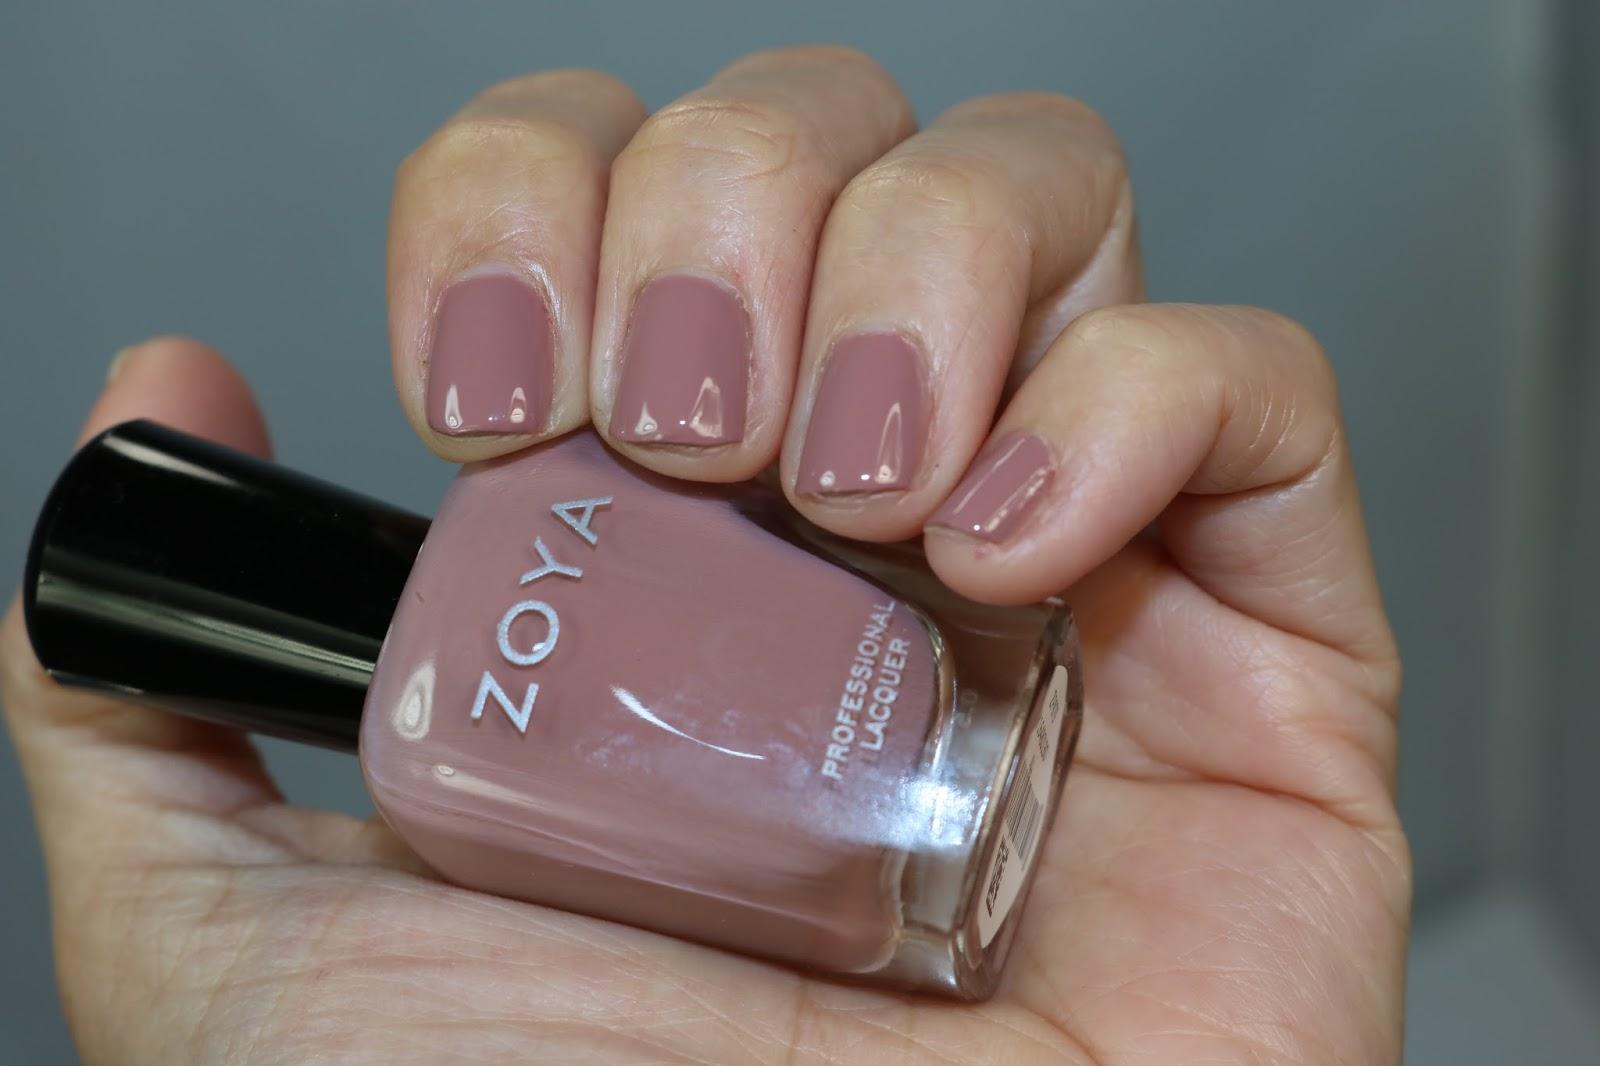 Zoya NAKED MANICURE - No polish polish / Polished Polyglot